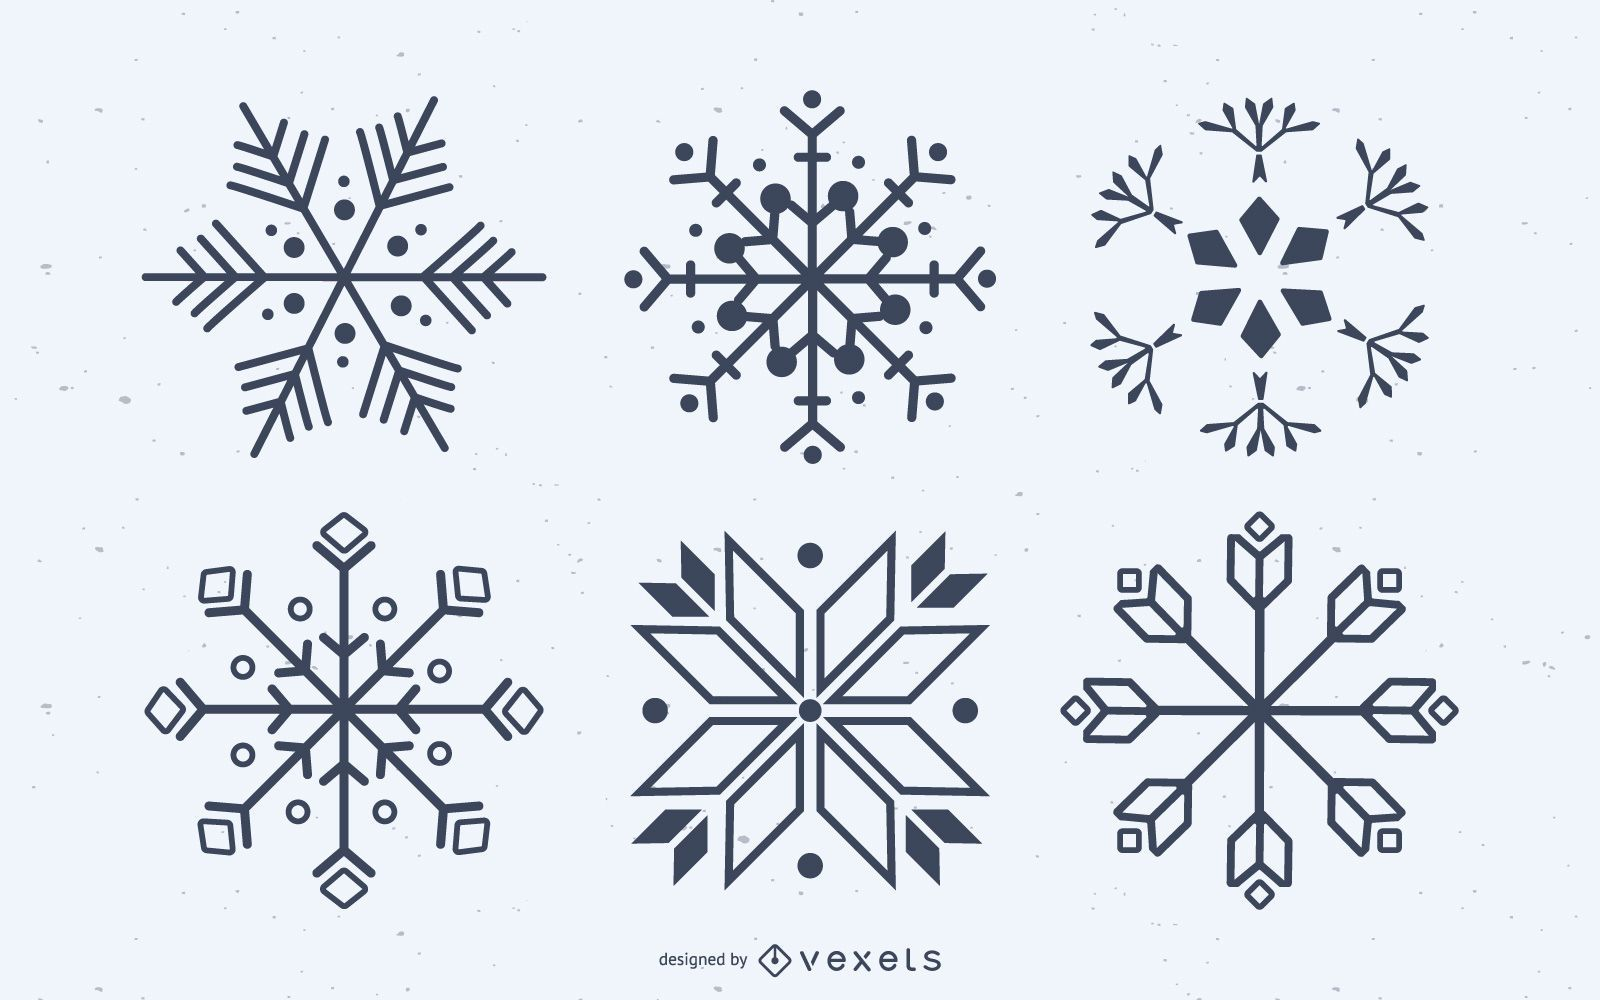 Snowflake silhouettes vector set